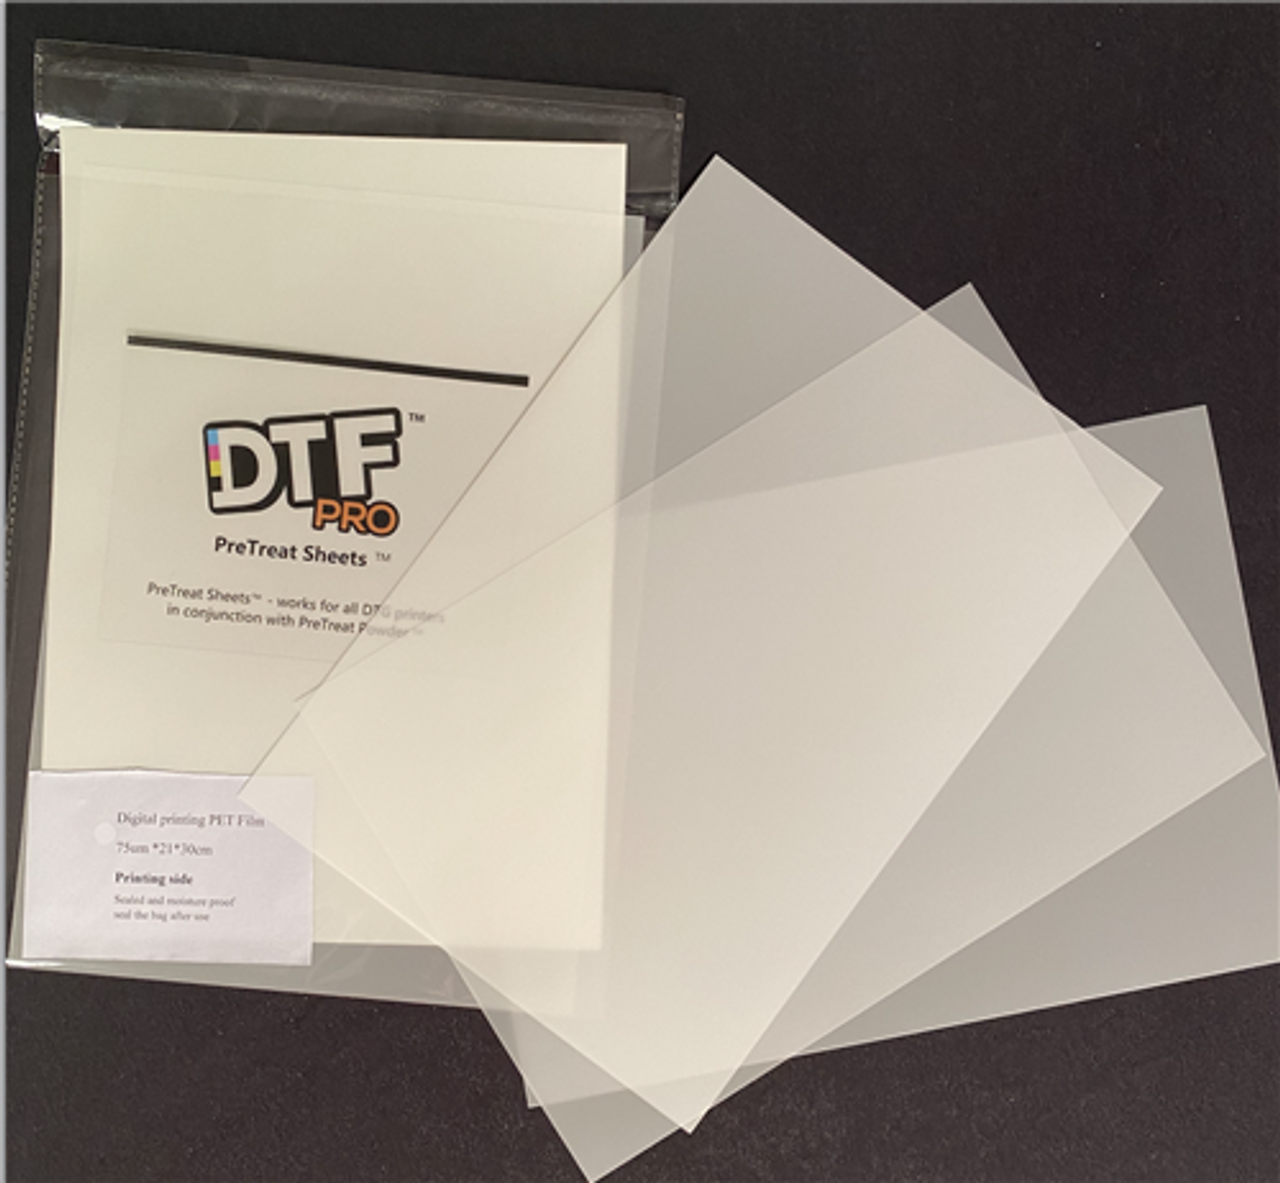 DTG Transfer Sheets (20) 8.3x11.7 - 35717